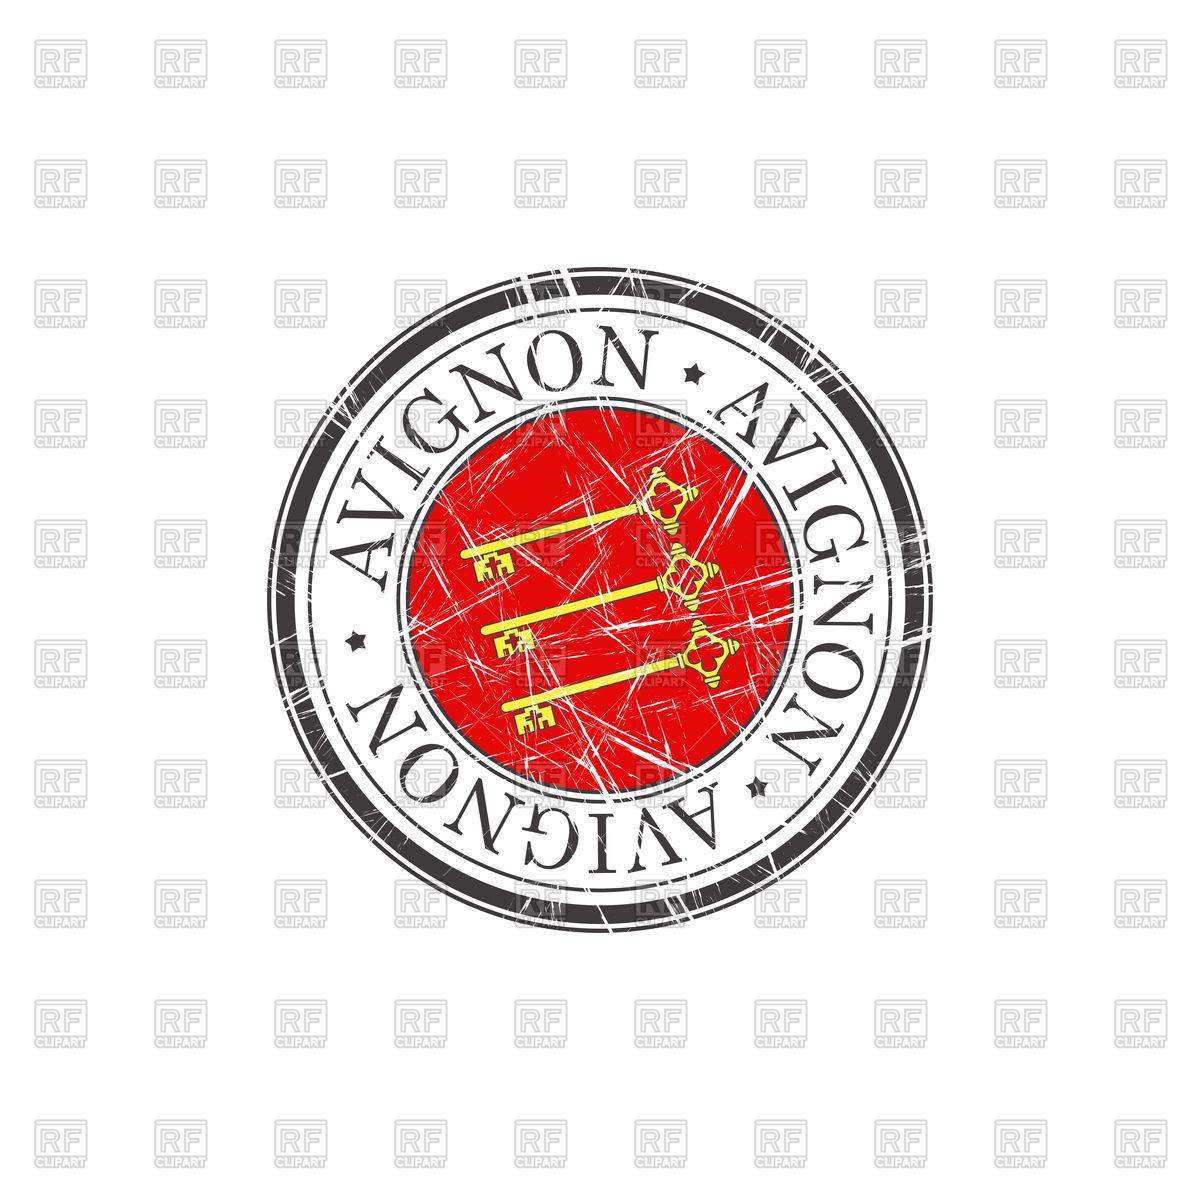 1200x1200 Avignon City Grunge Rubber Stamp Vector Image Vector Artwork Of